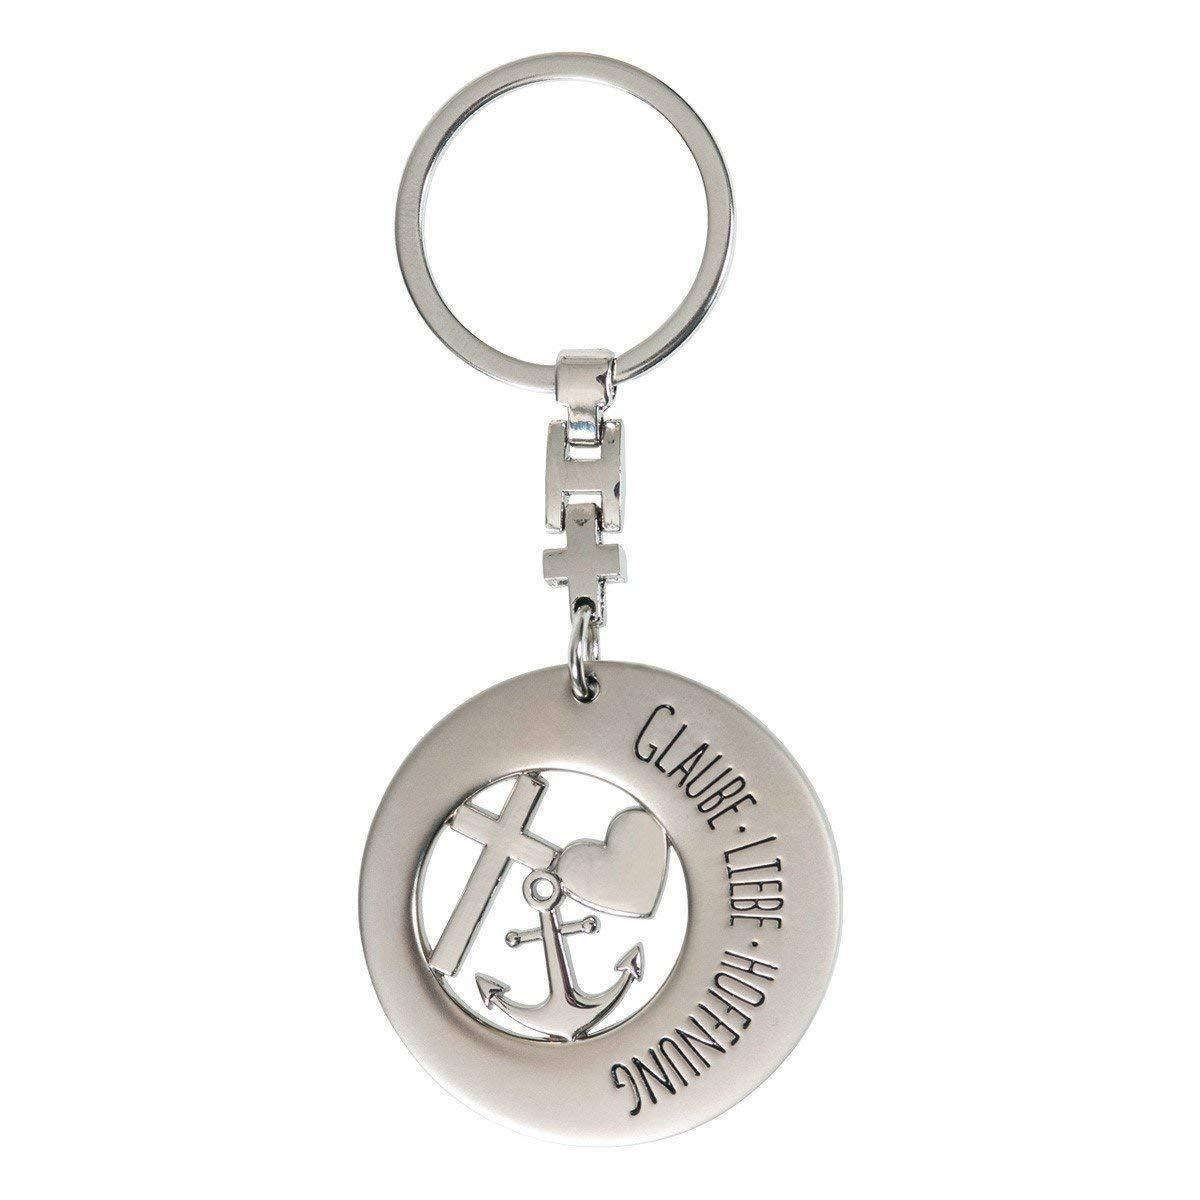 Liebe Gilde Metall Schlüsselanhänger Symbol Glaube Hoffnung Geschenk Silber